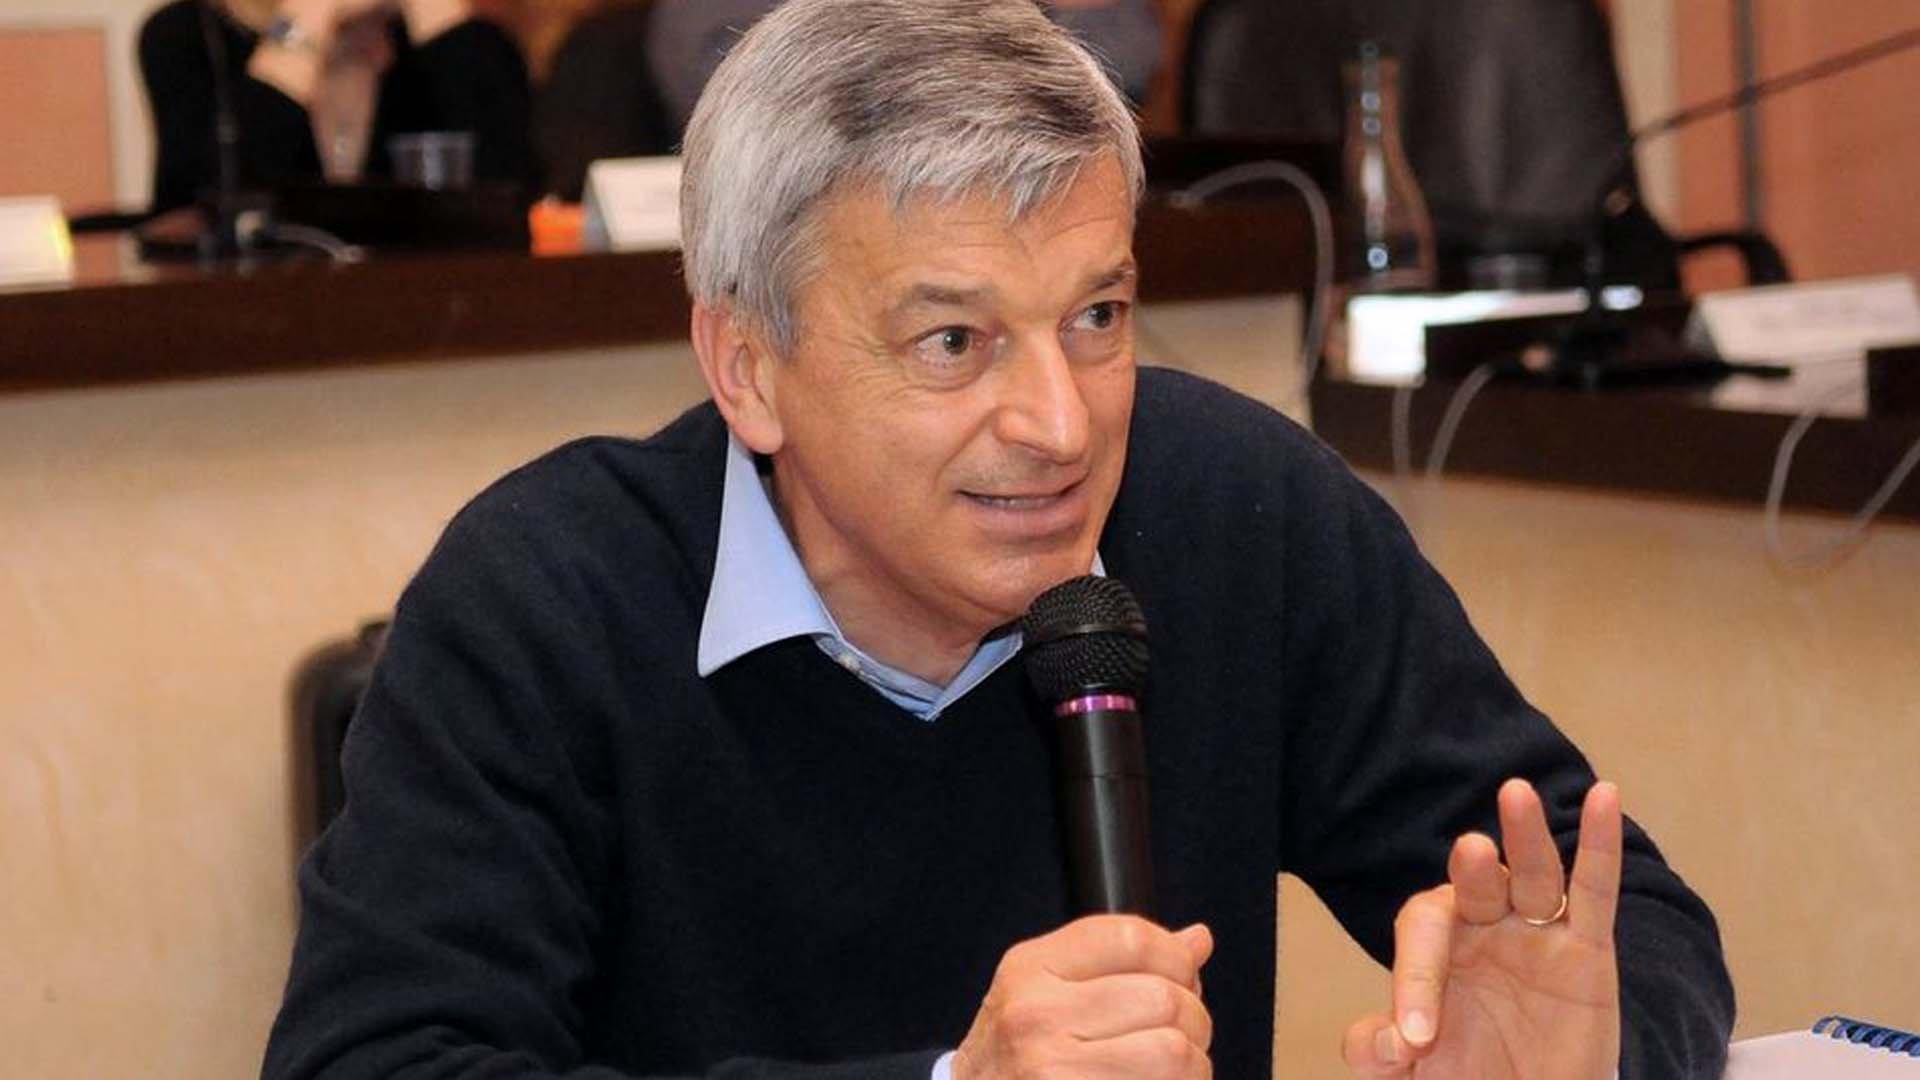 Il dott. Stefano Montanari